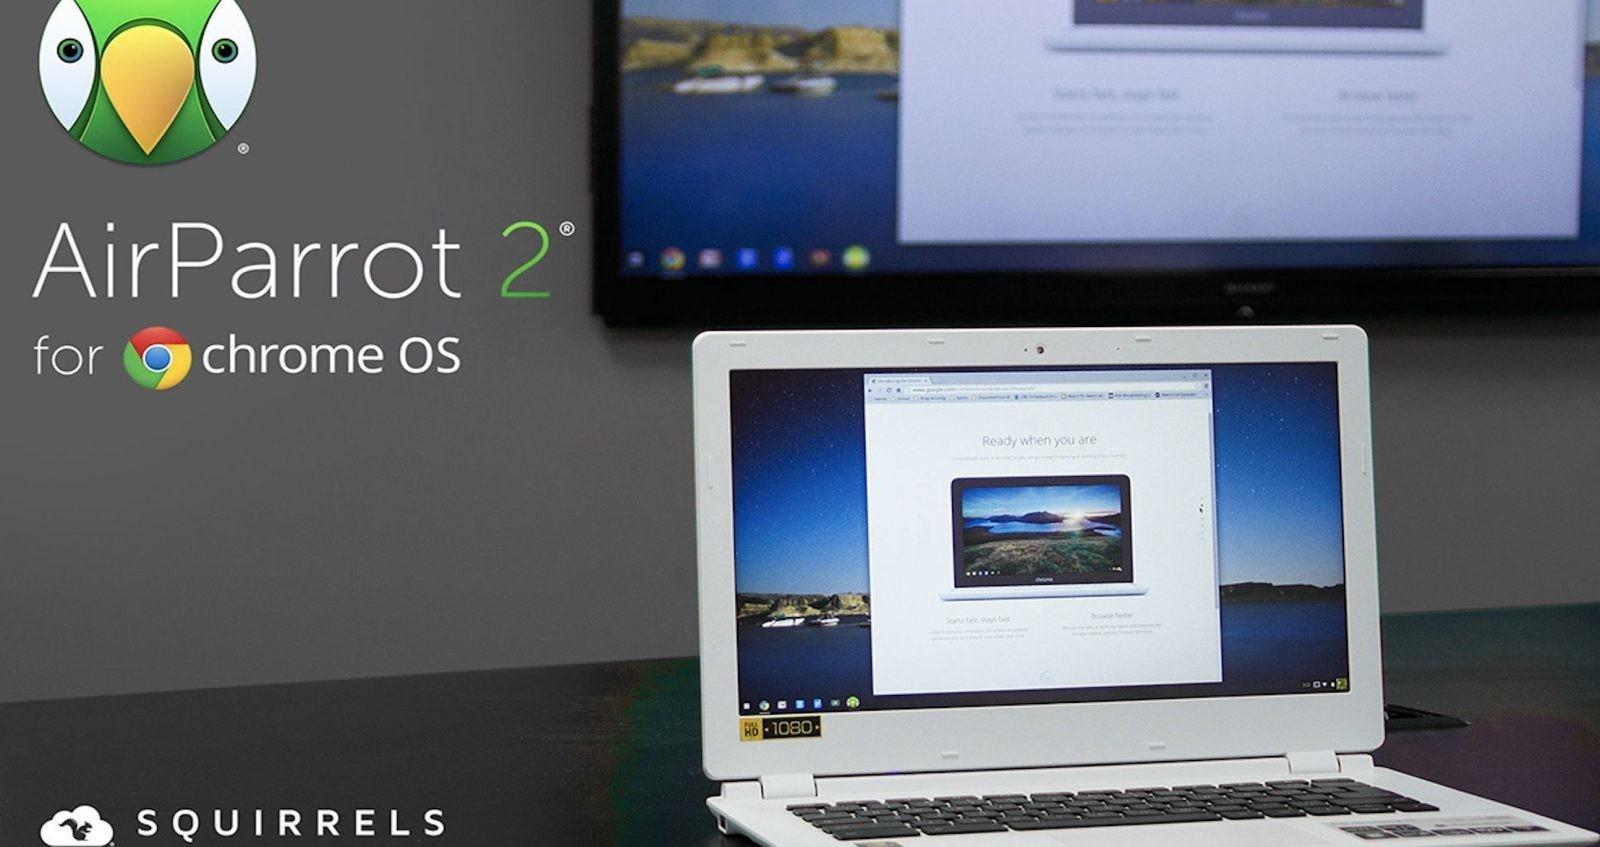 EduTech: How to integrate Chromebooks w/ Apple TV for seamless presentations & collaboration